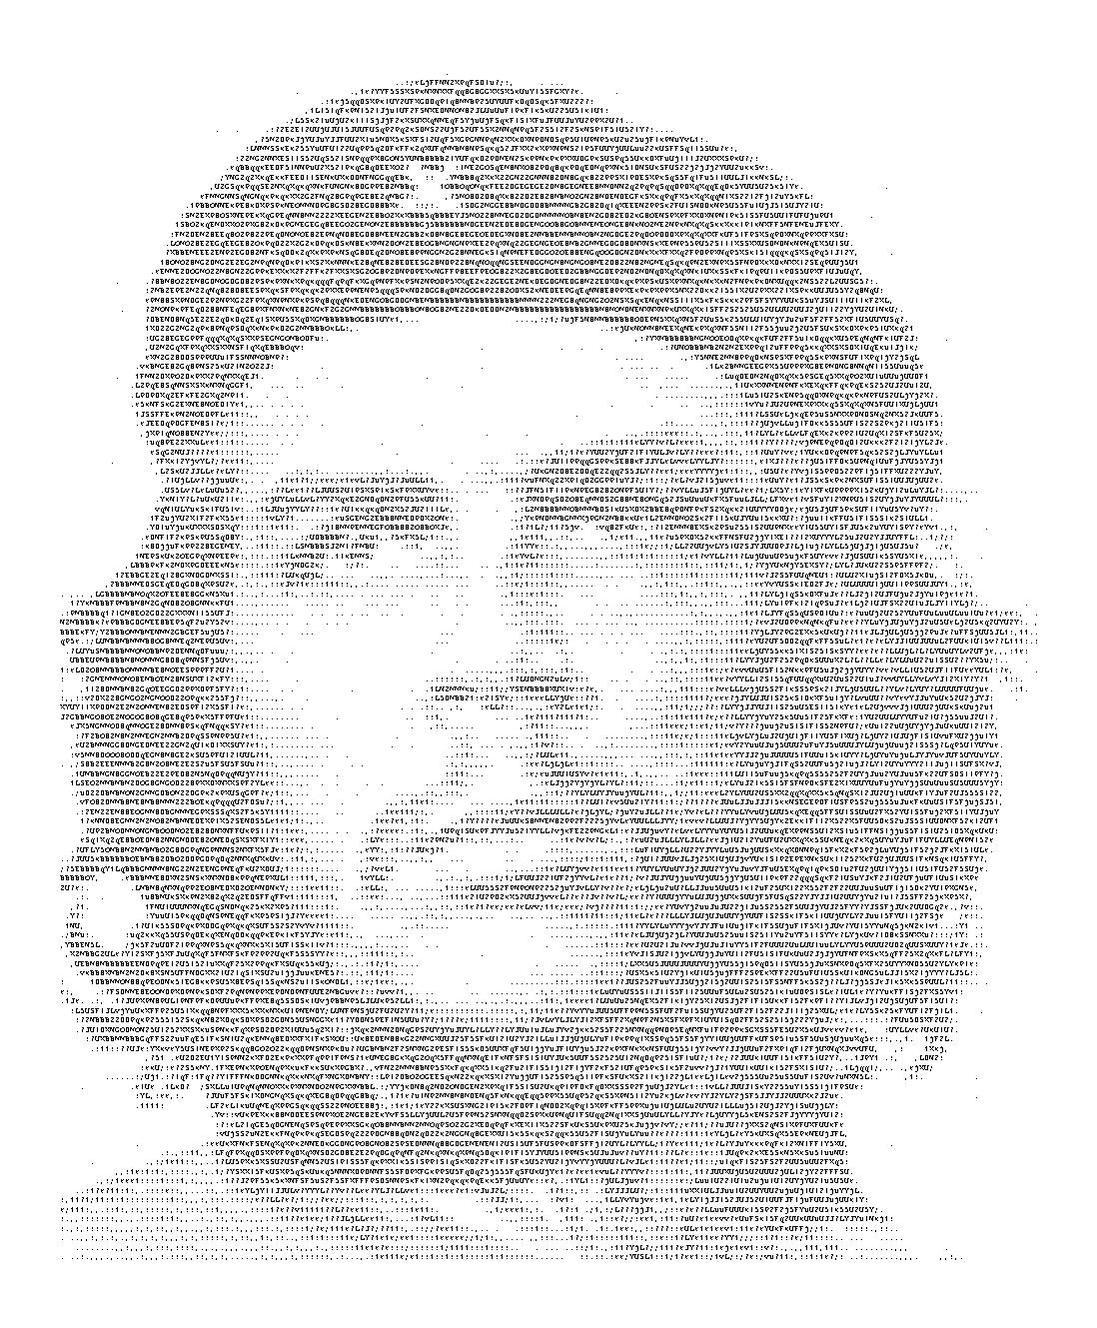 huy-iz-simvolov